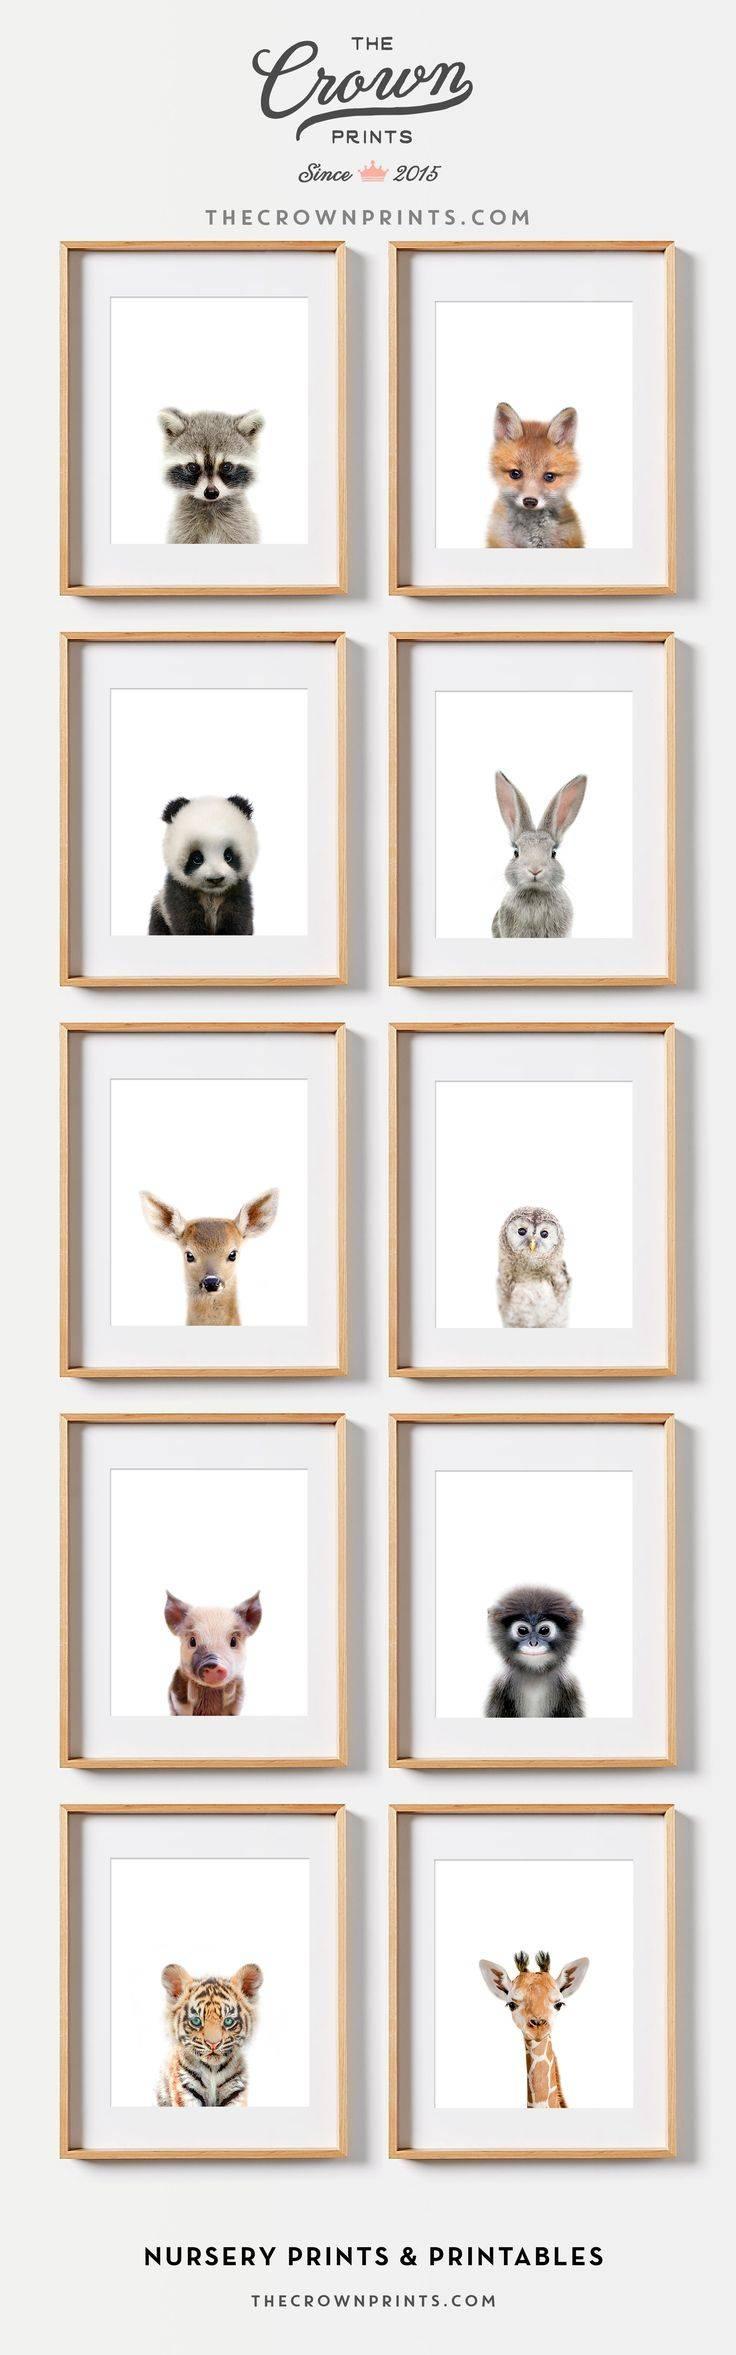 Best 25+ Baby Animal Nursery Ideas On Pinterest | Animal Nursery Intended For Recent Animal Wall Artfor Nursery (View 13 of 20)